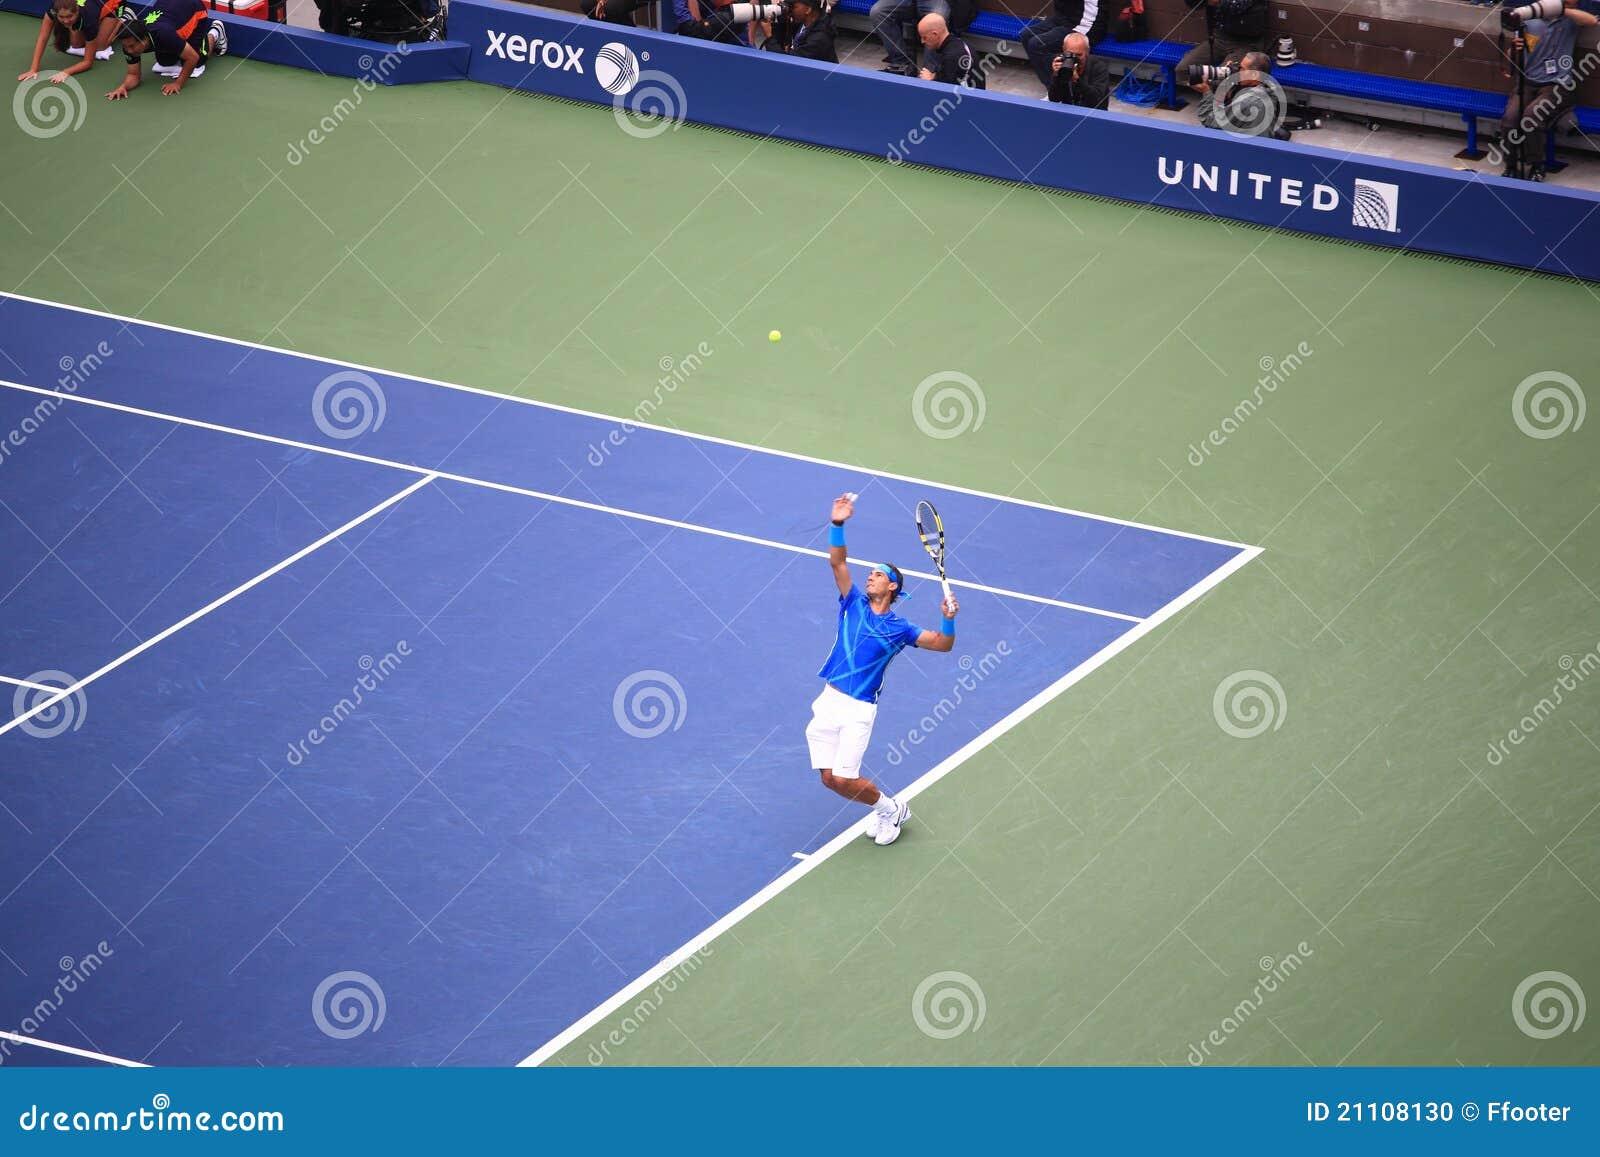 U.S. Abra el tenis - Rafael Nadal